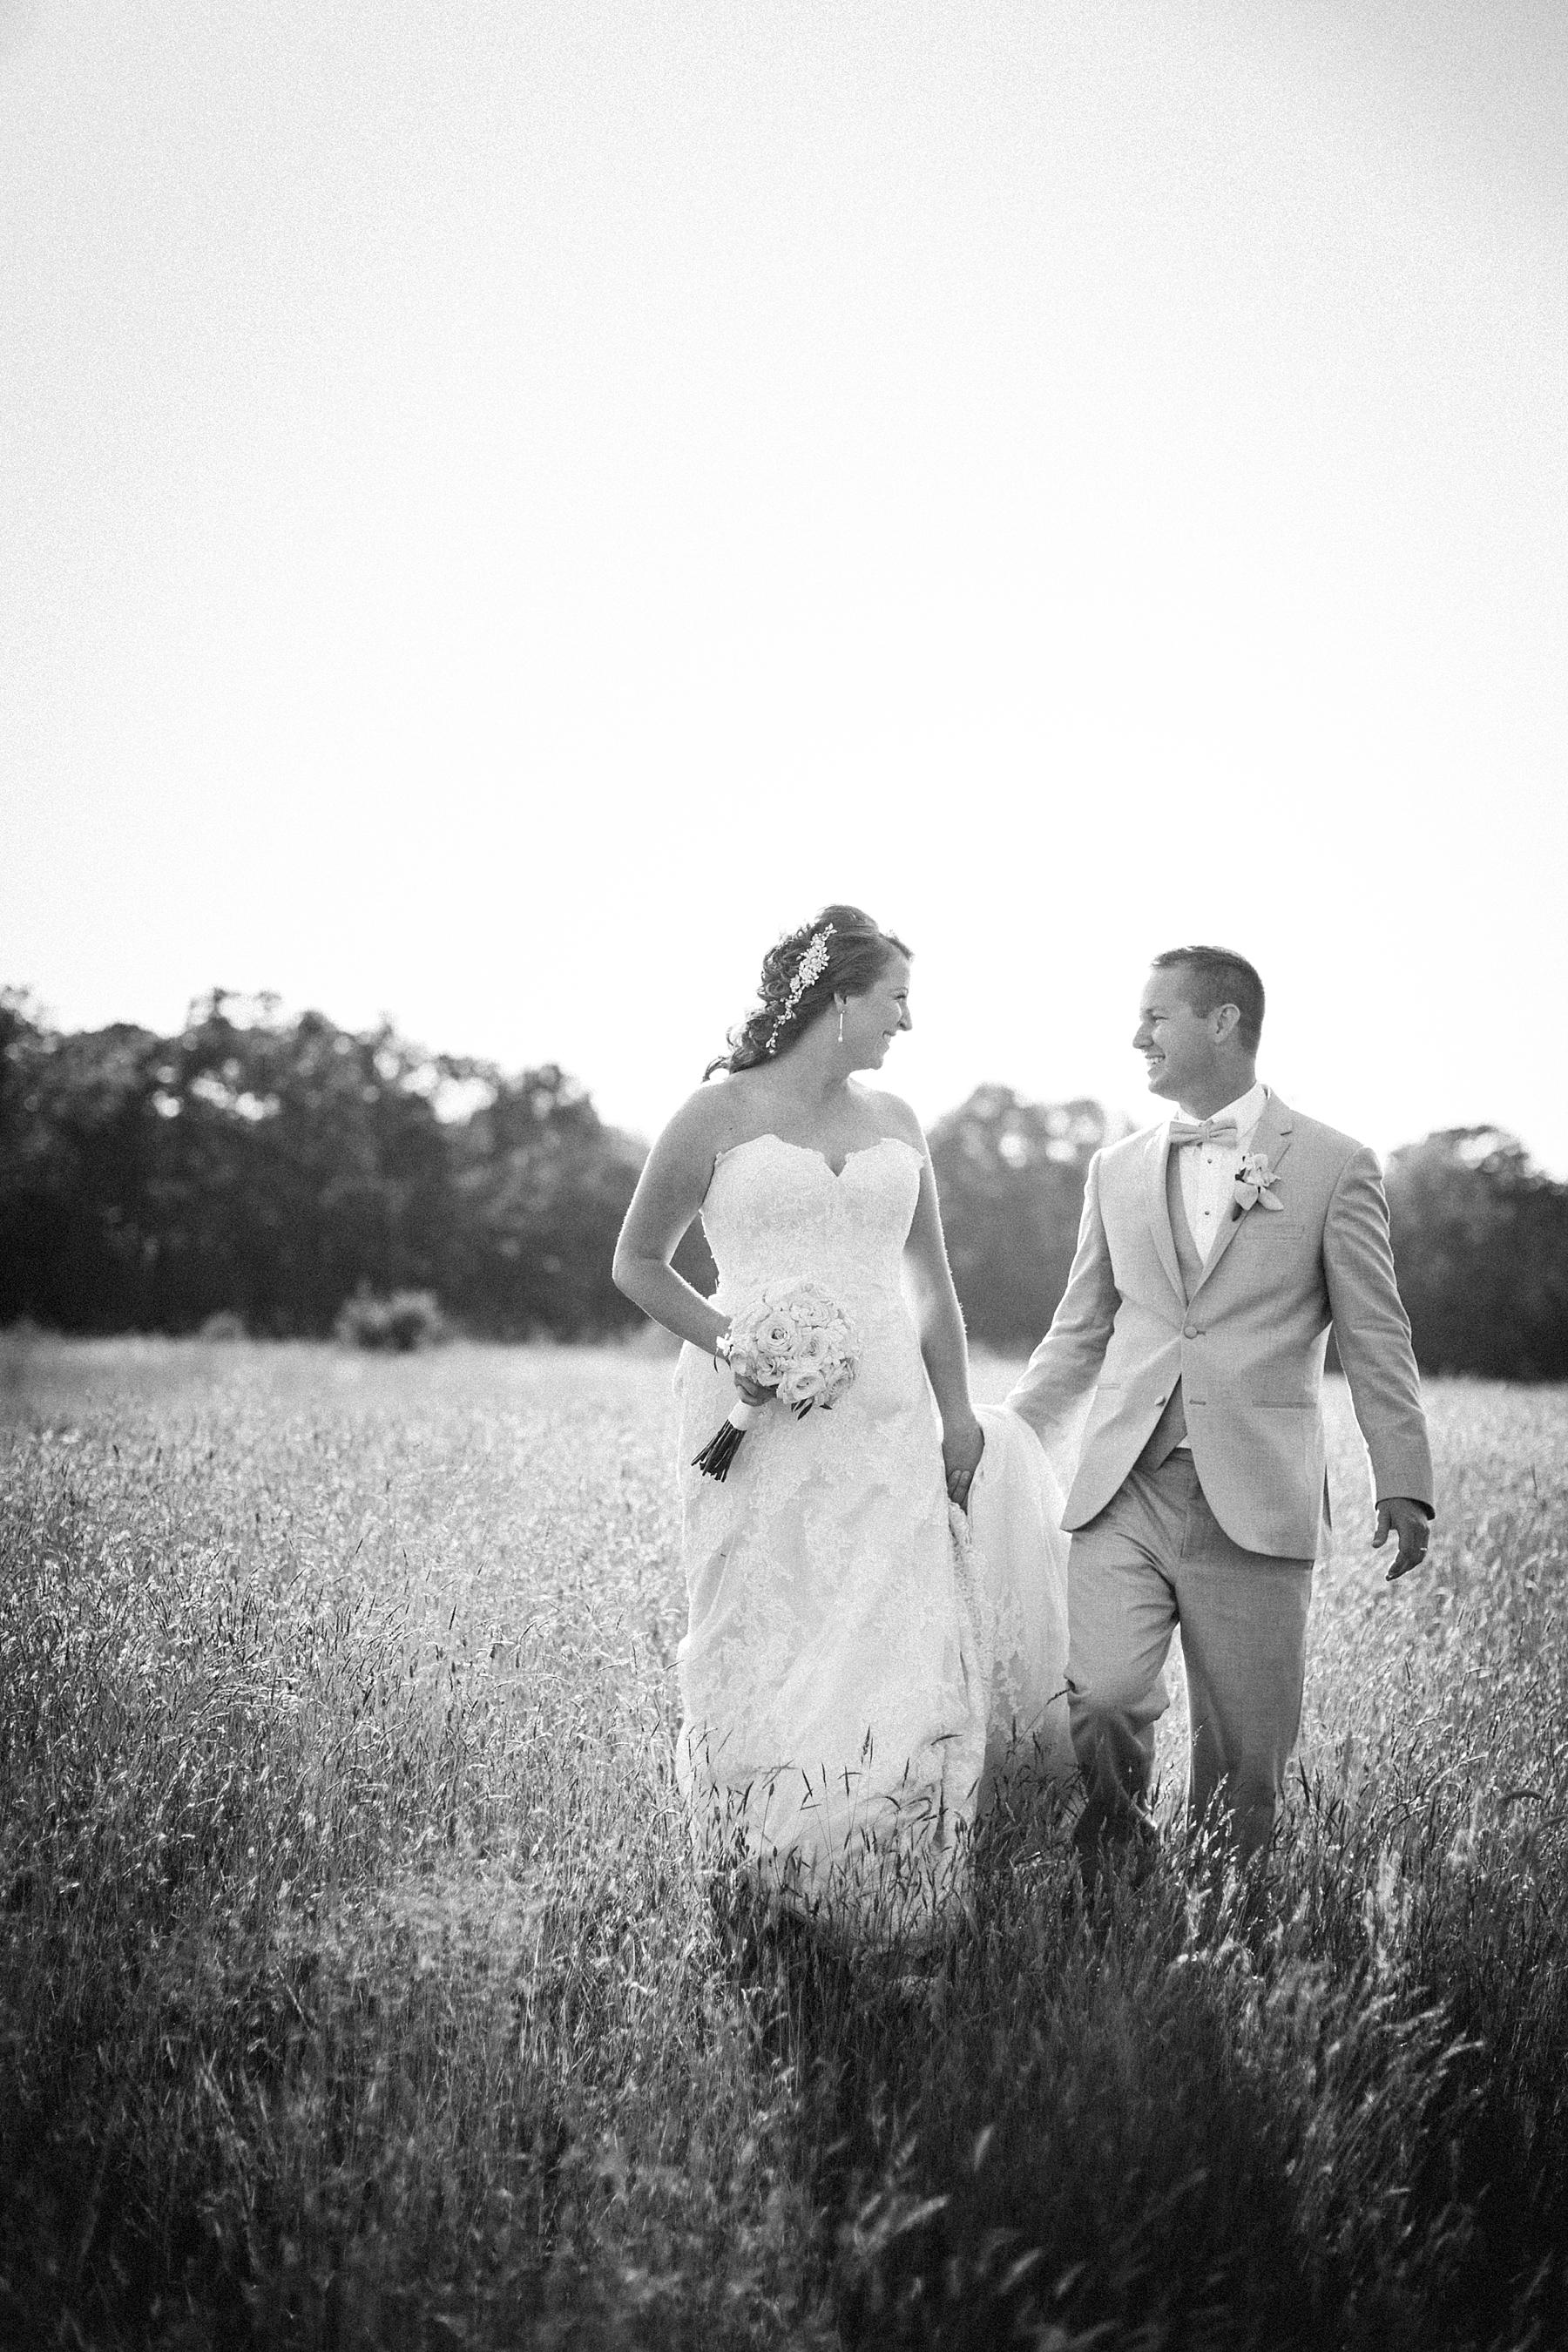 farm-wedding-engagement-session-destination-intimate_0041.jpg